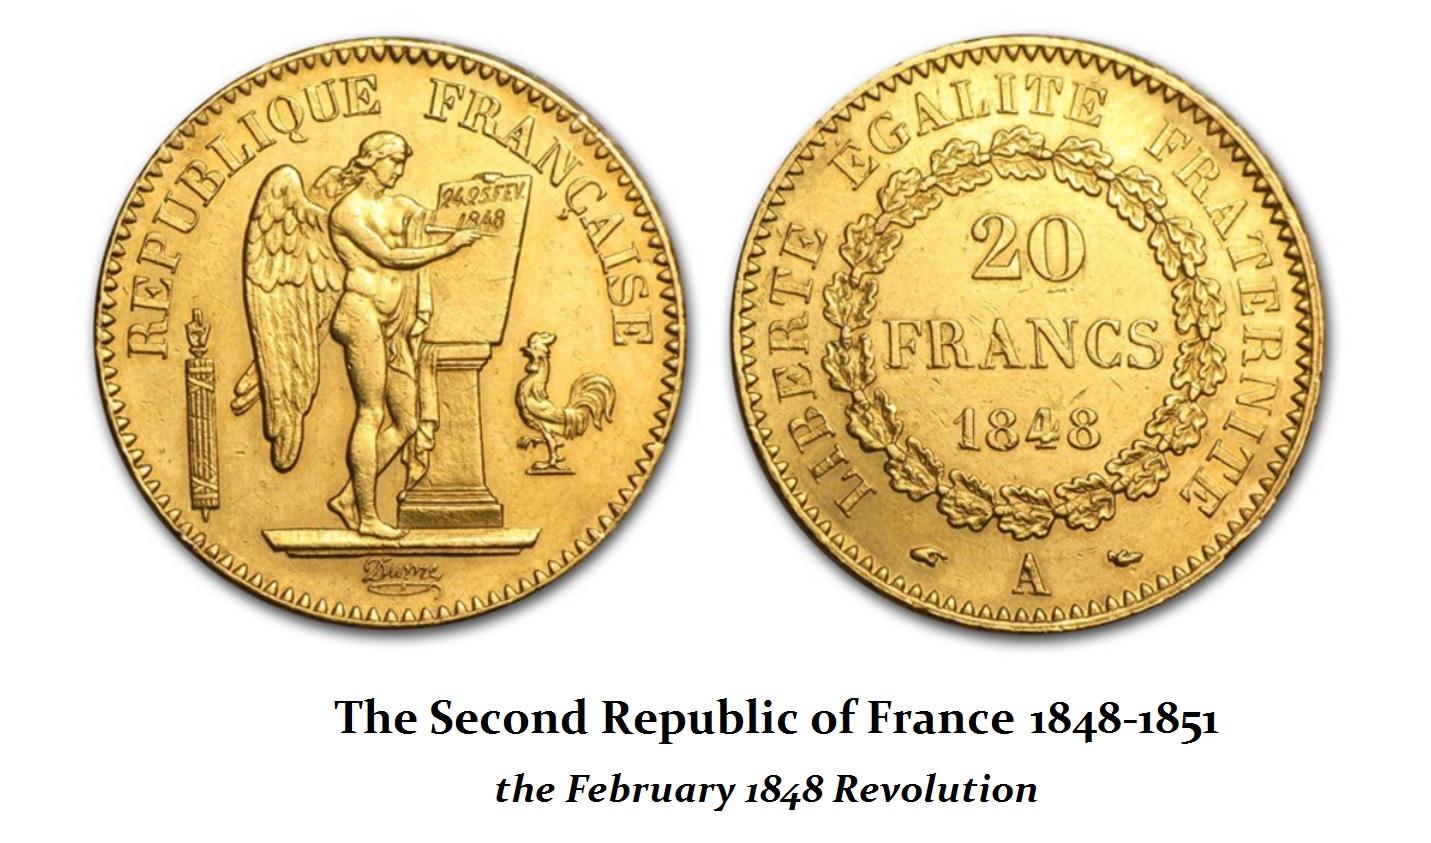 1848 Second Republic